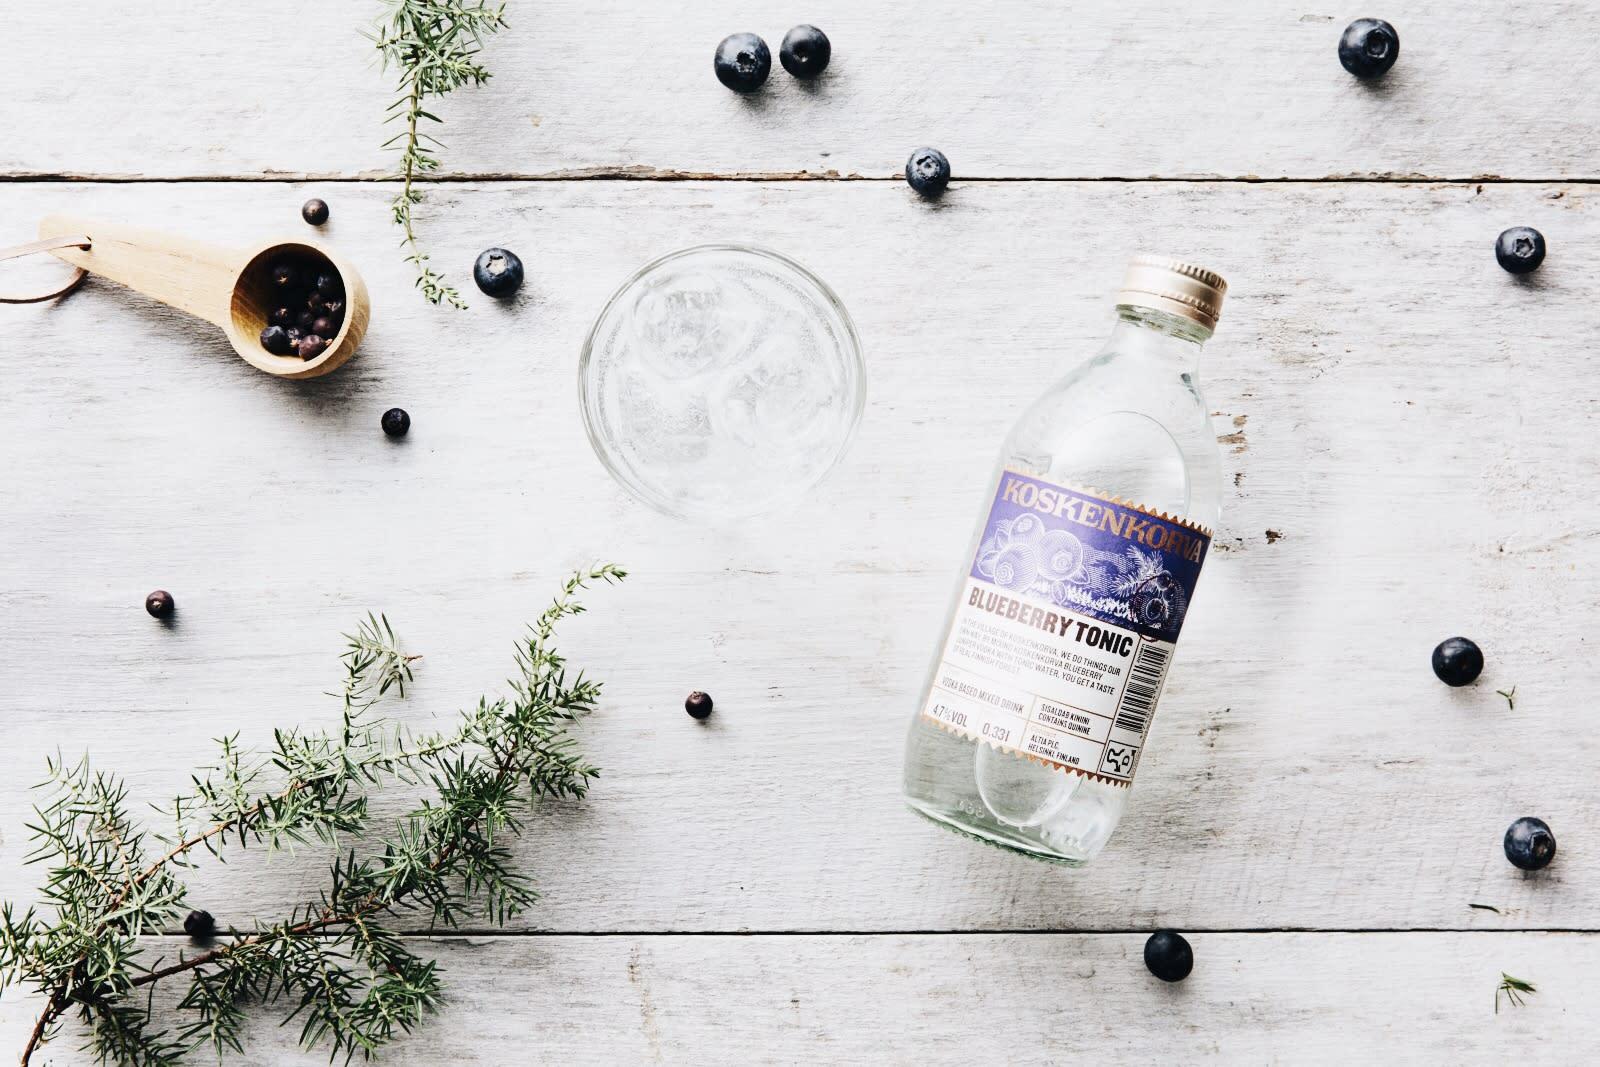 Koskenkorva Blueberry Tonic, Blueberries and Rosemary